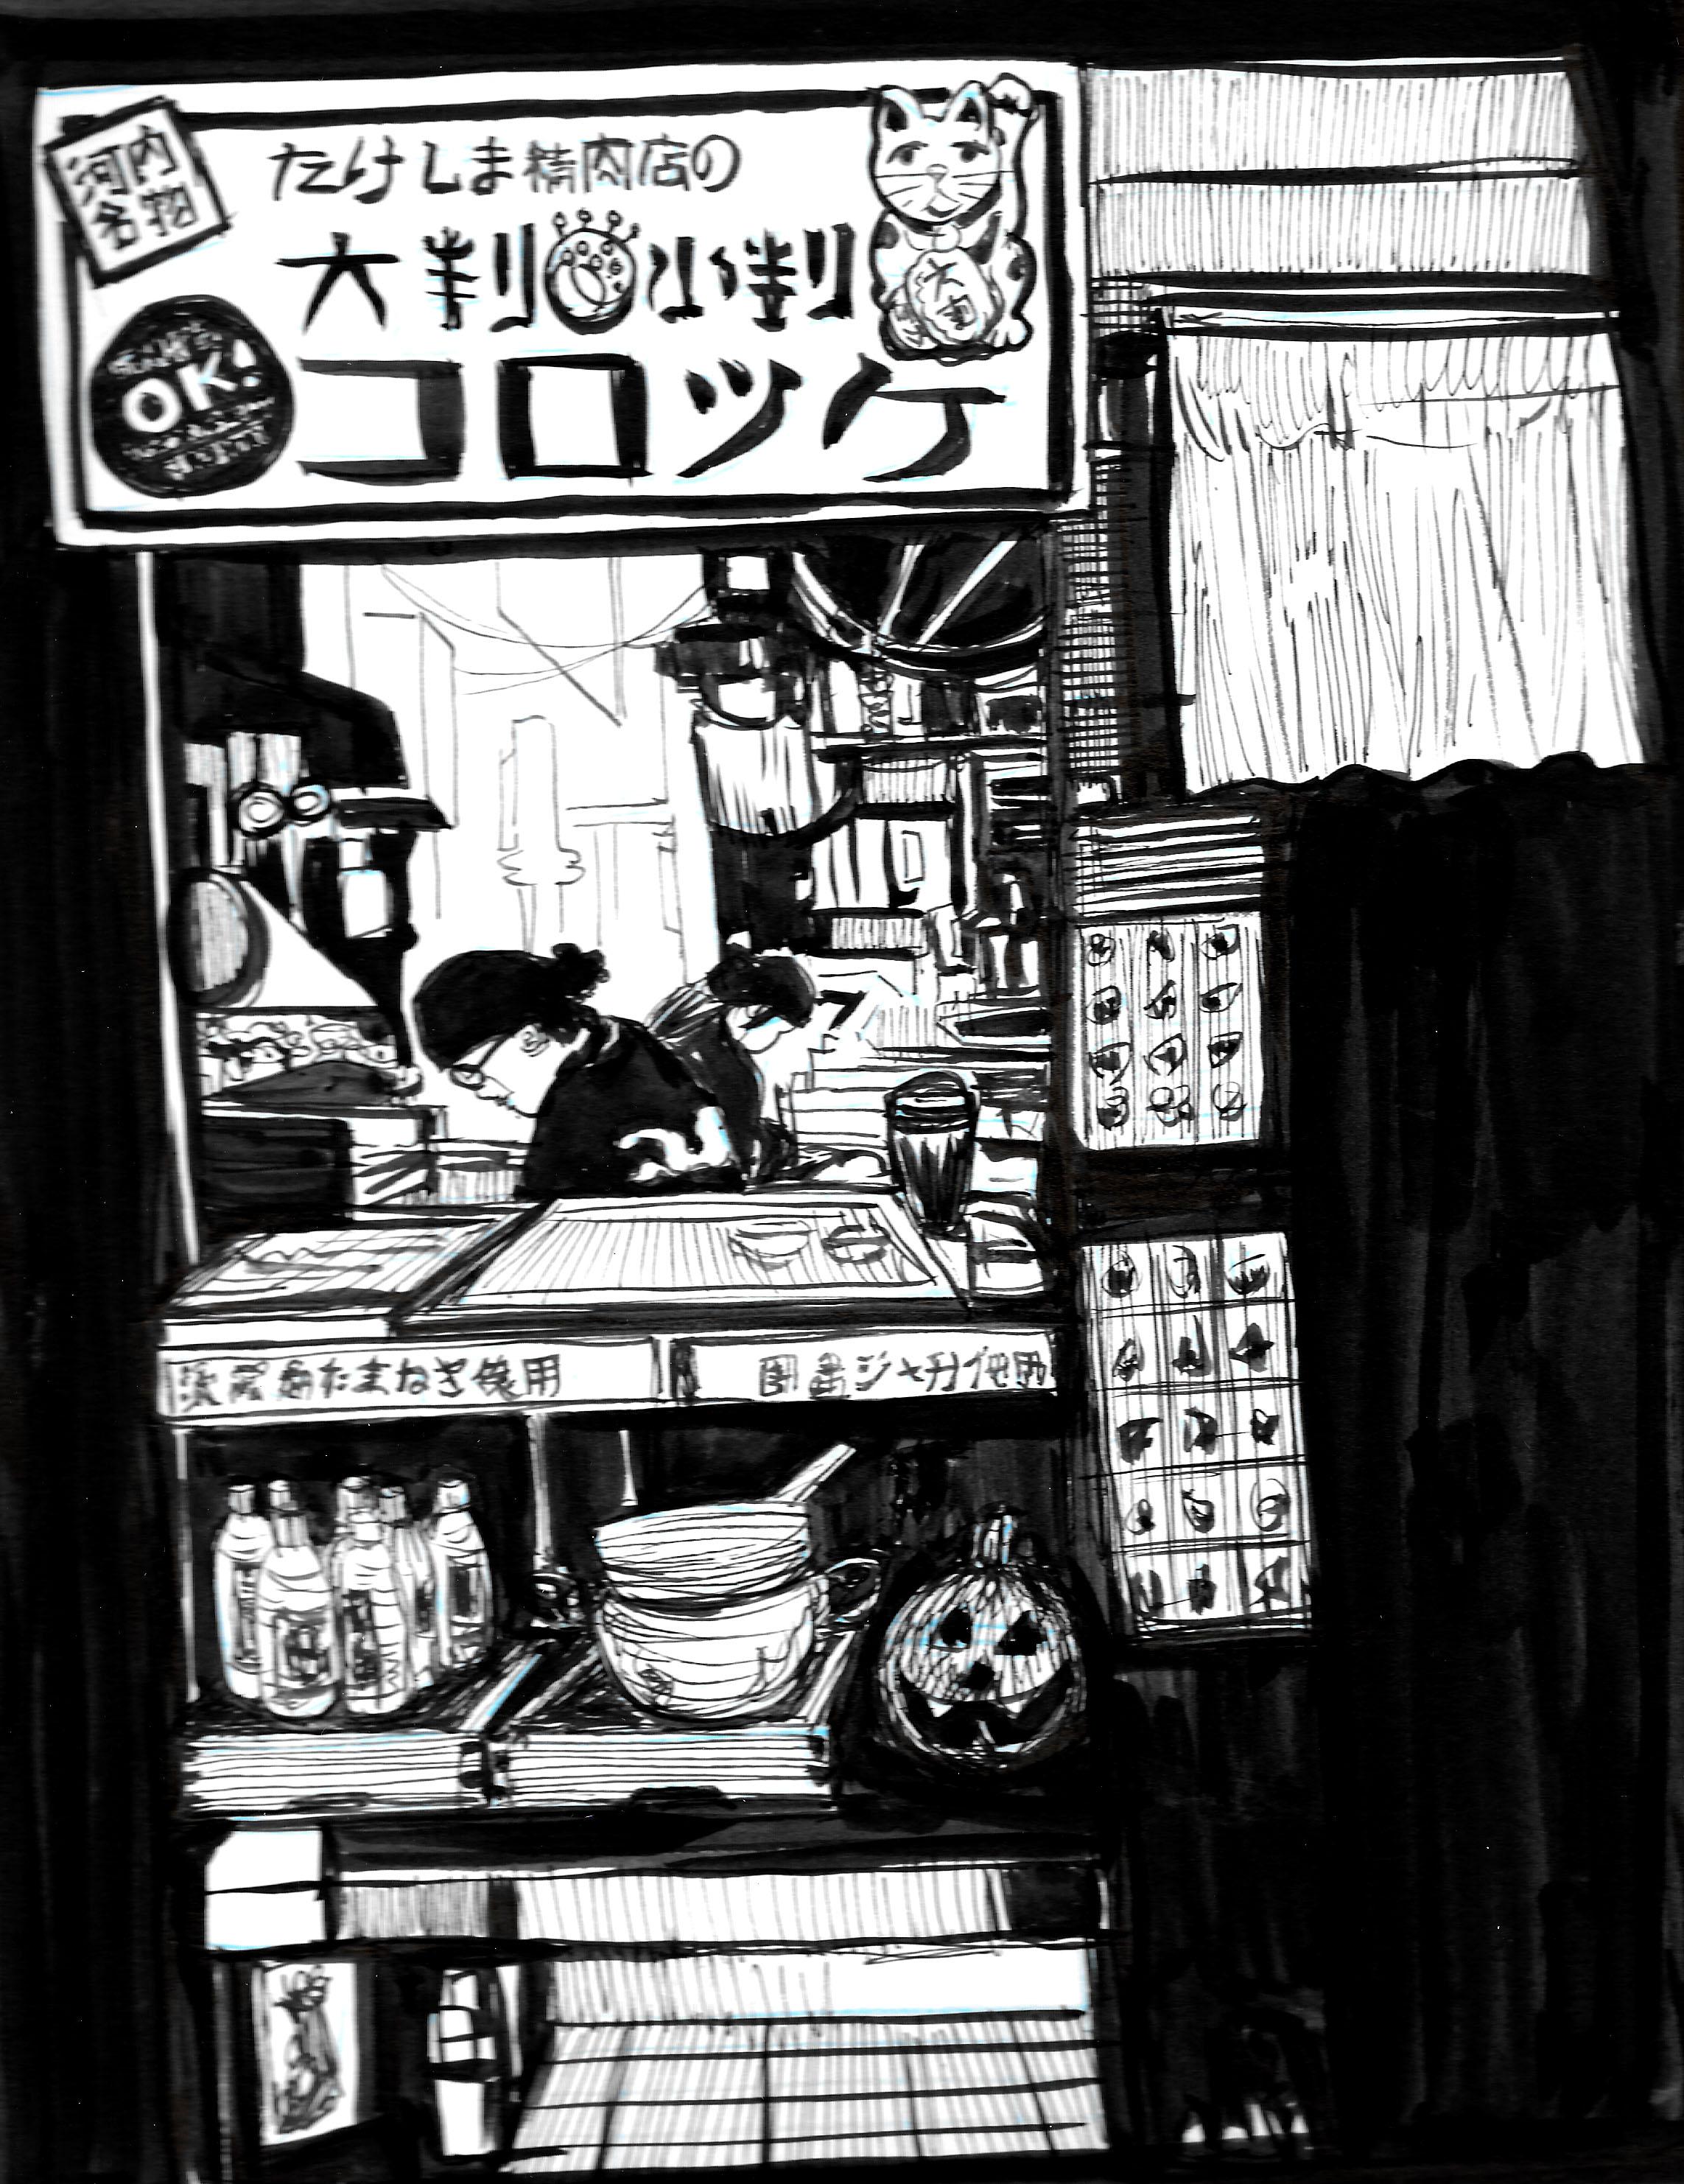 Jacko_Japan.jpg